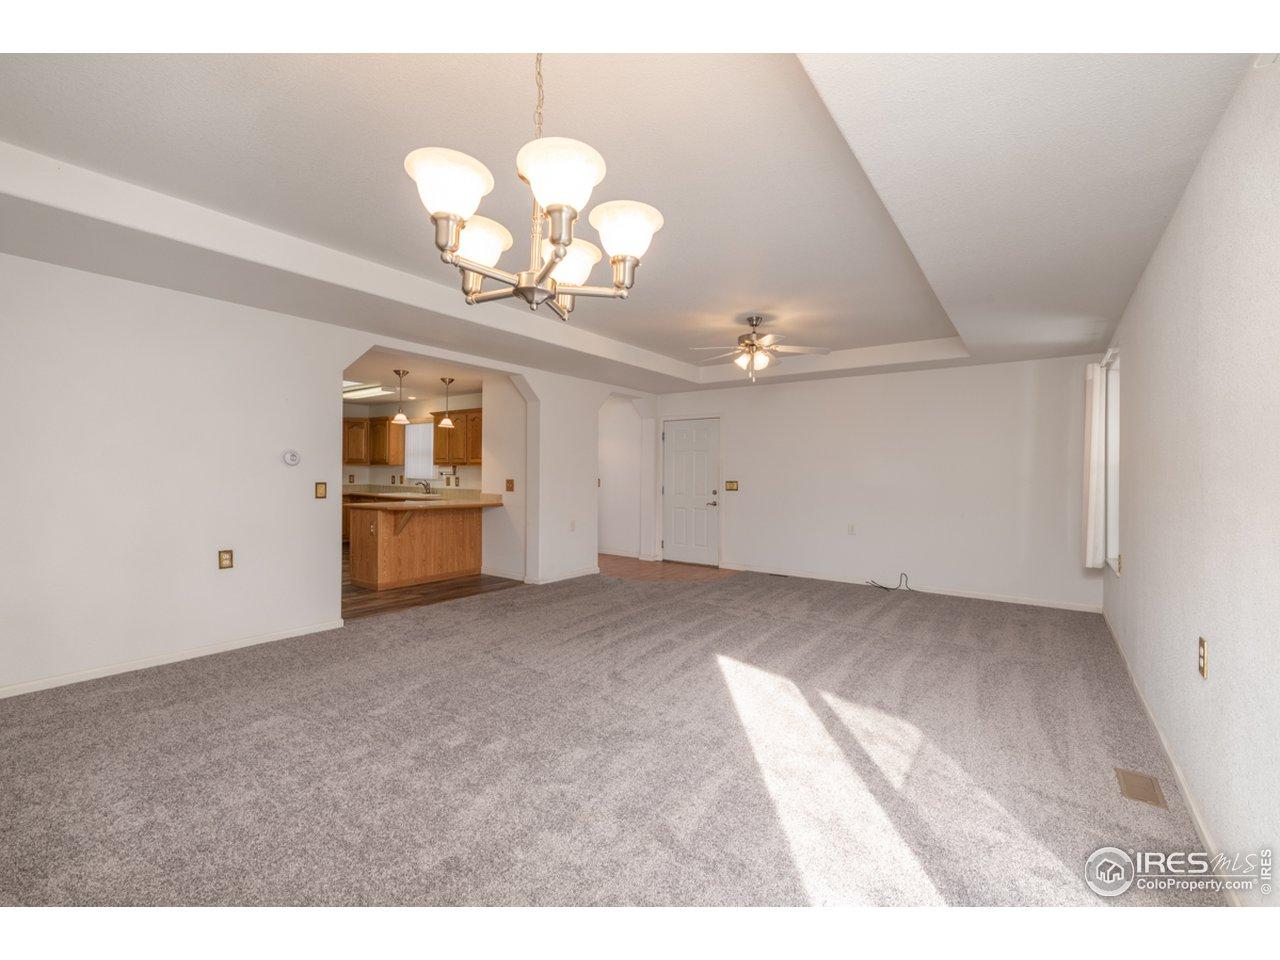 Dining room into Living room and garage door